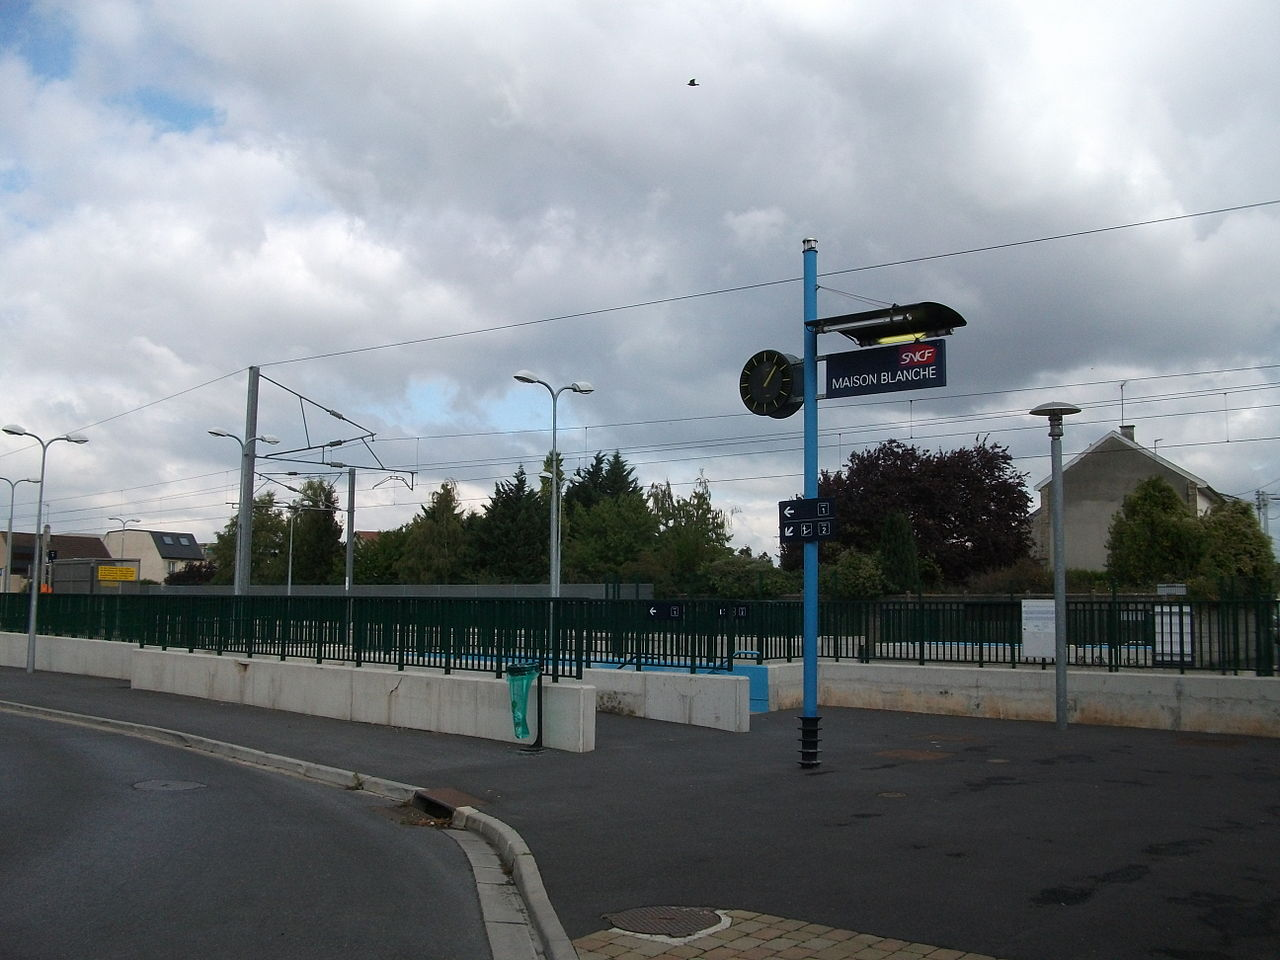 Reims-maison-blanche-train-station